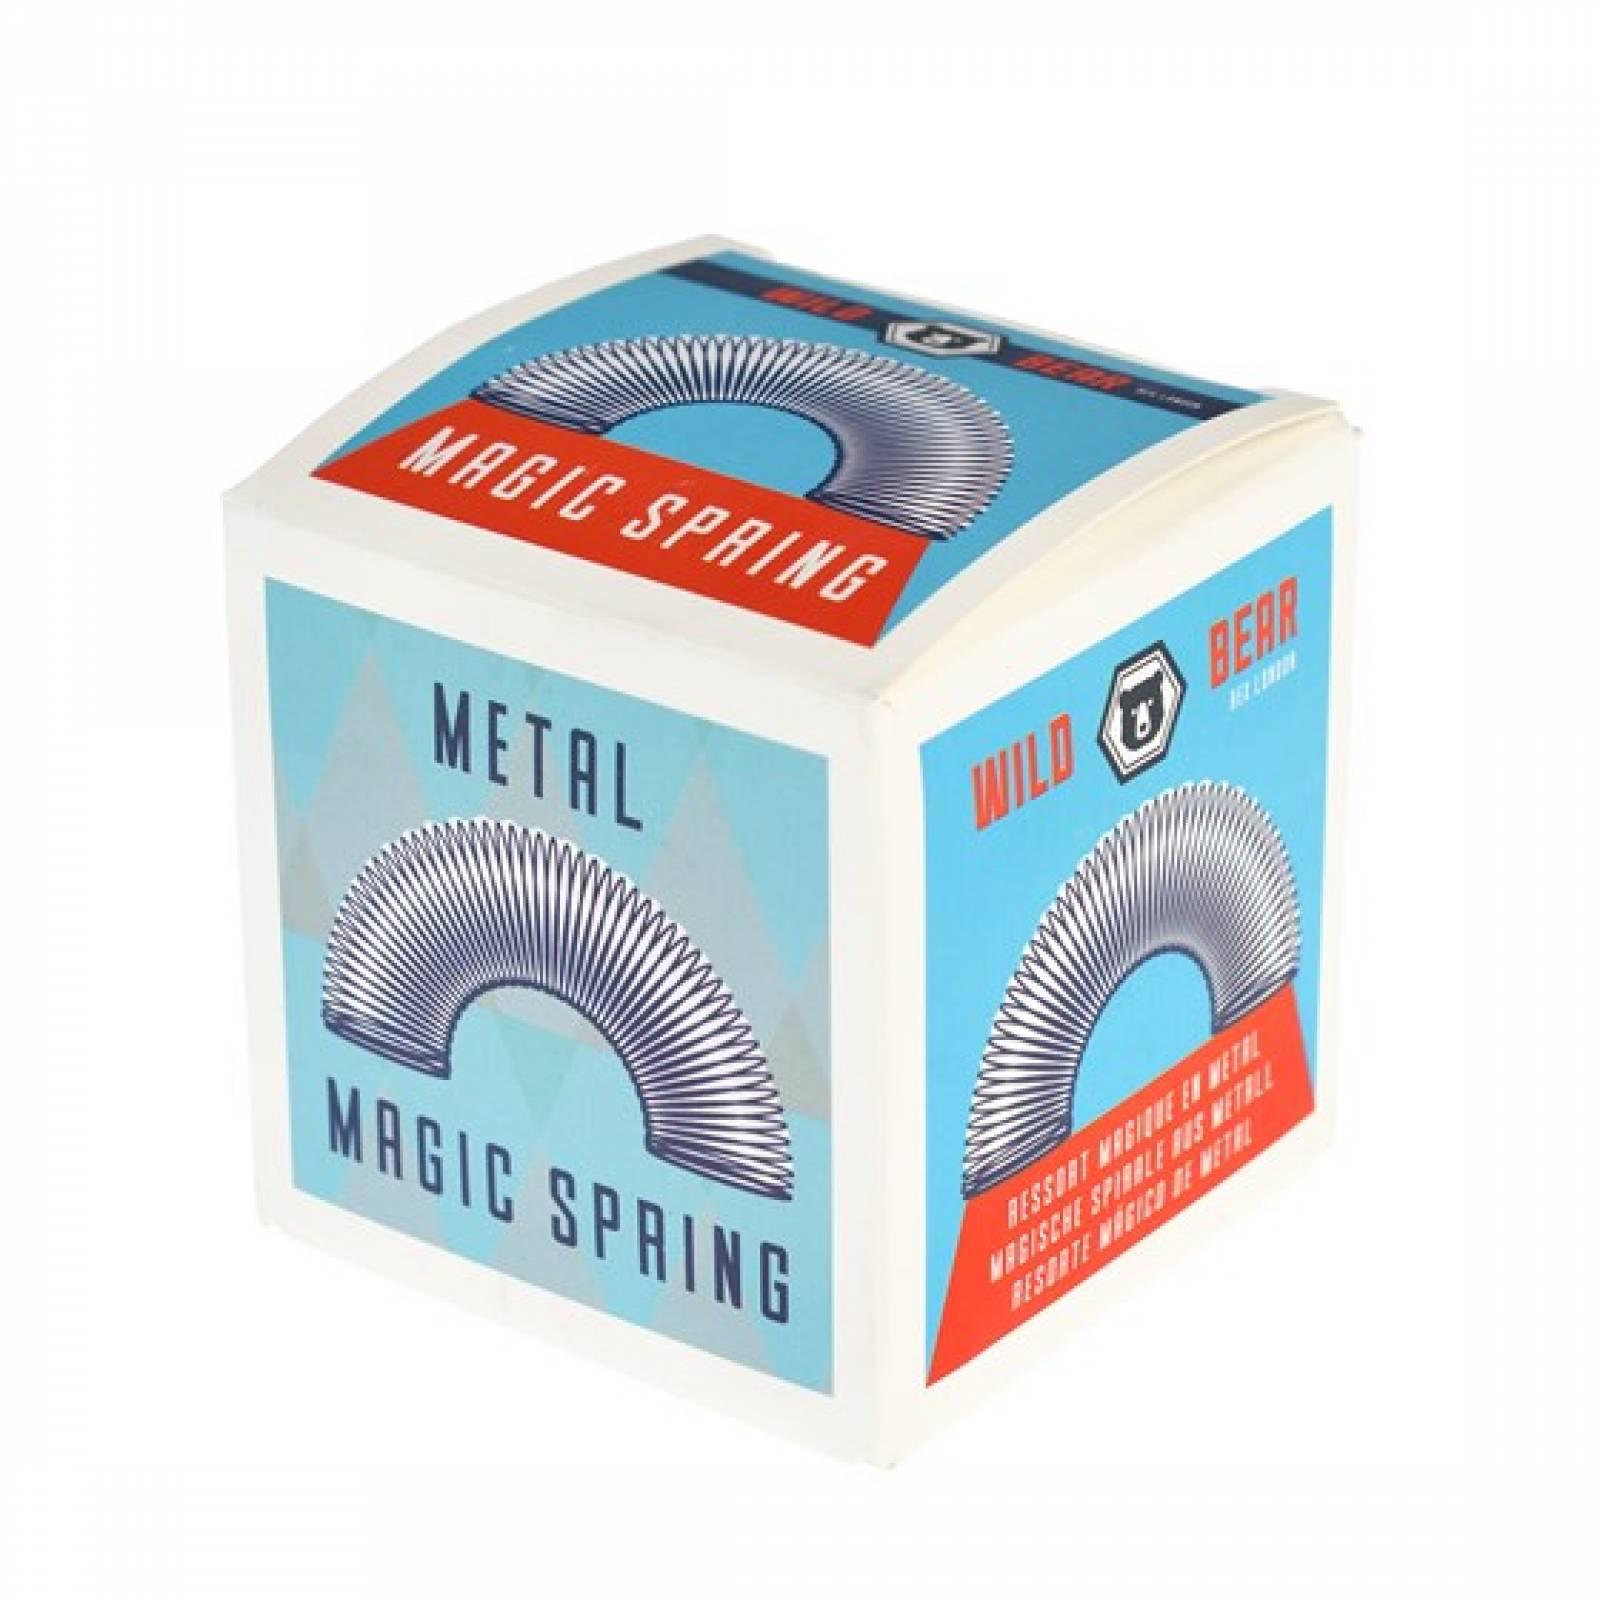 Slinky Metal Springy Toy 6+